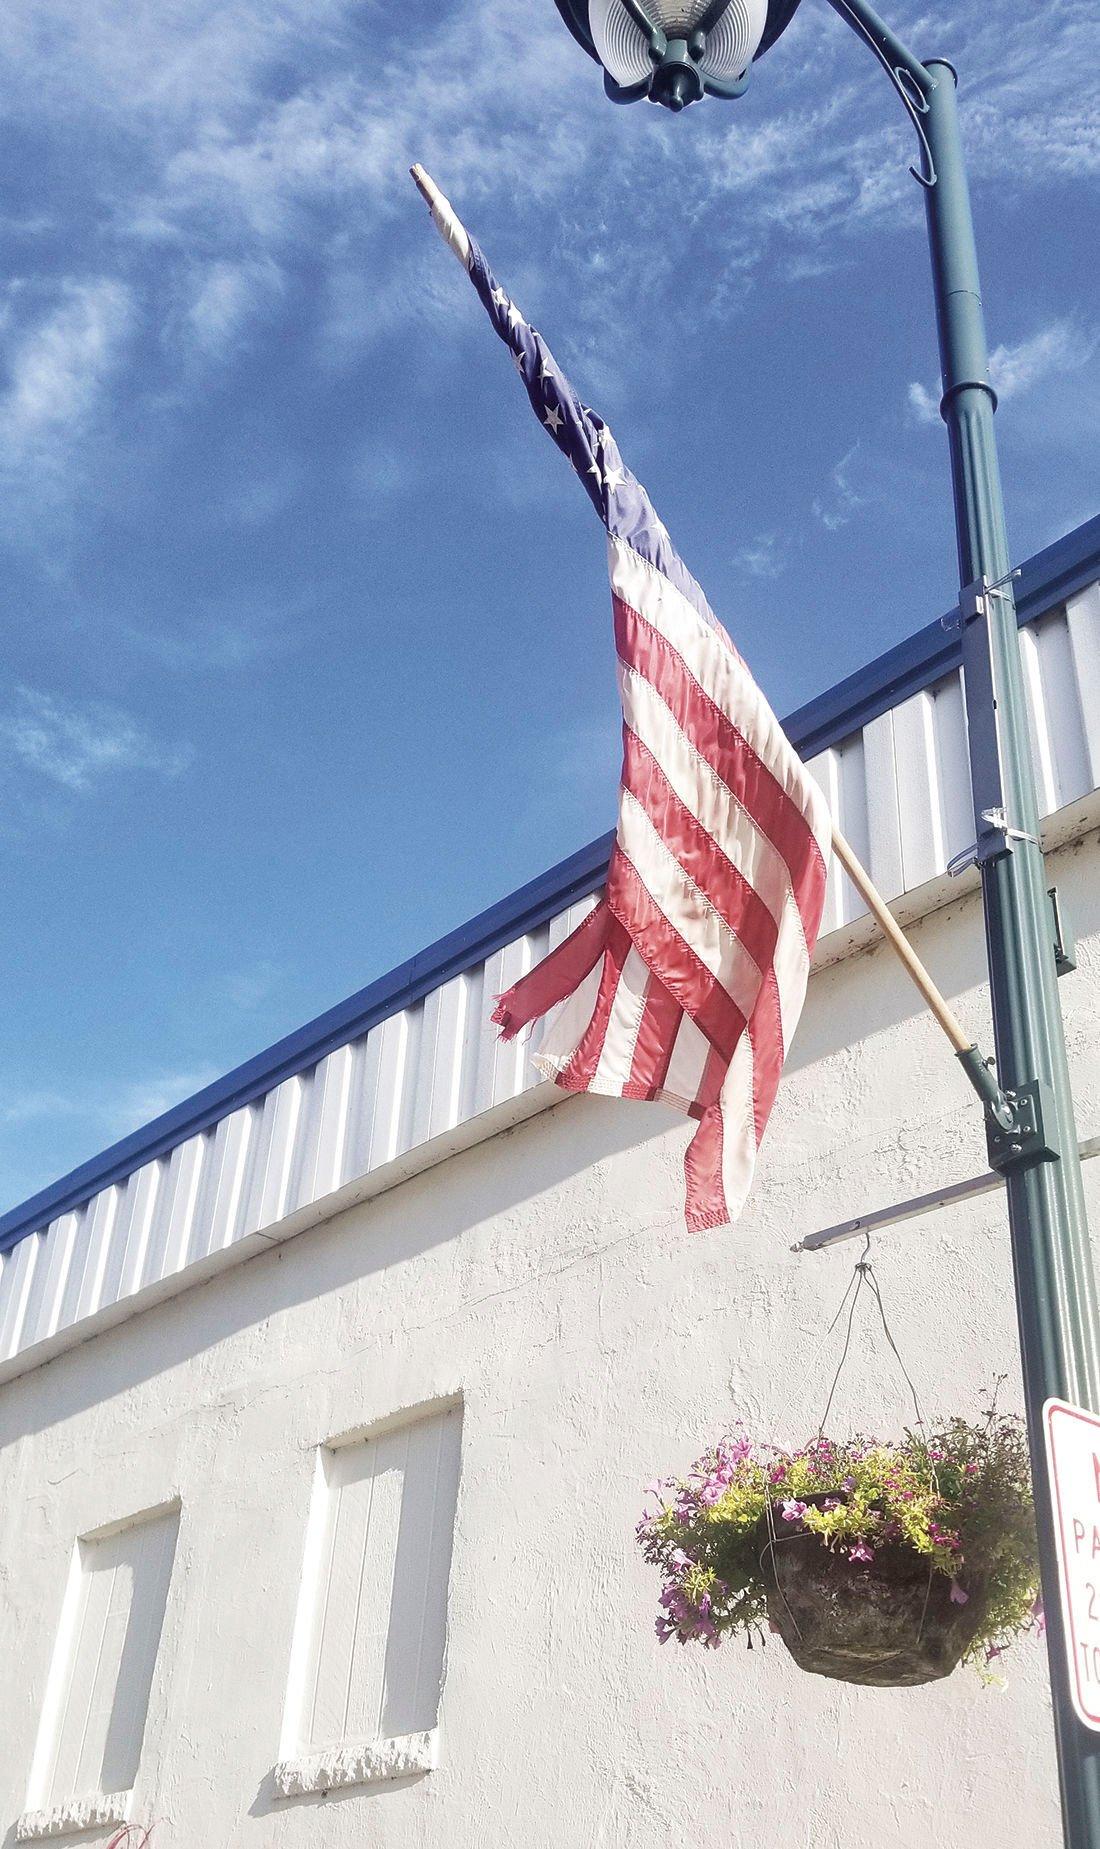 City admonished over flag disrespect